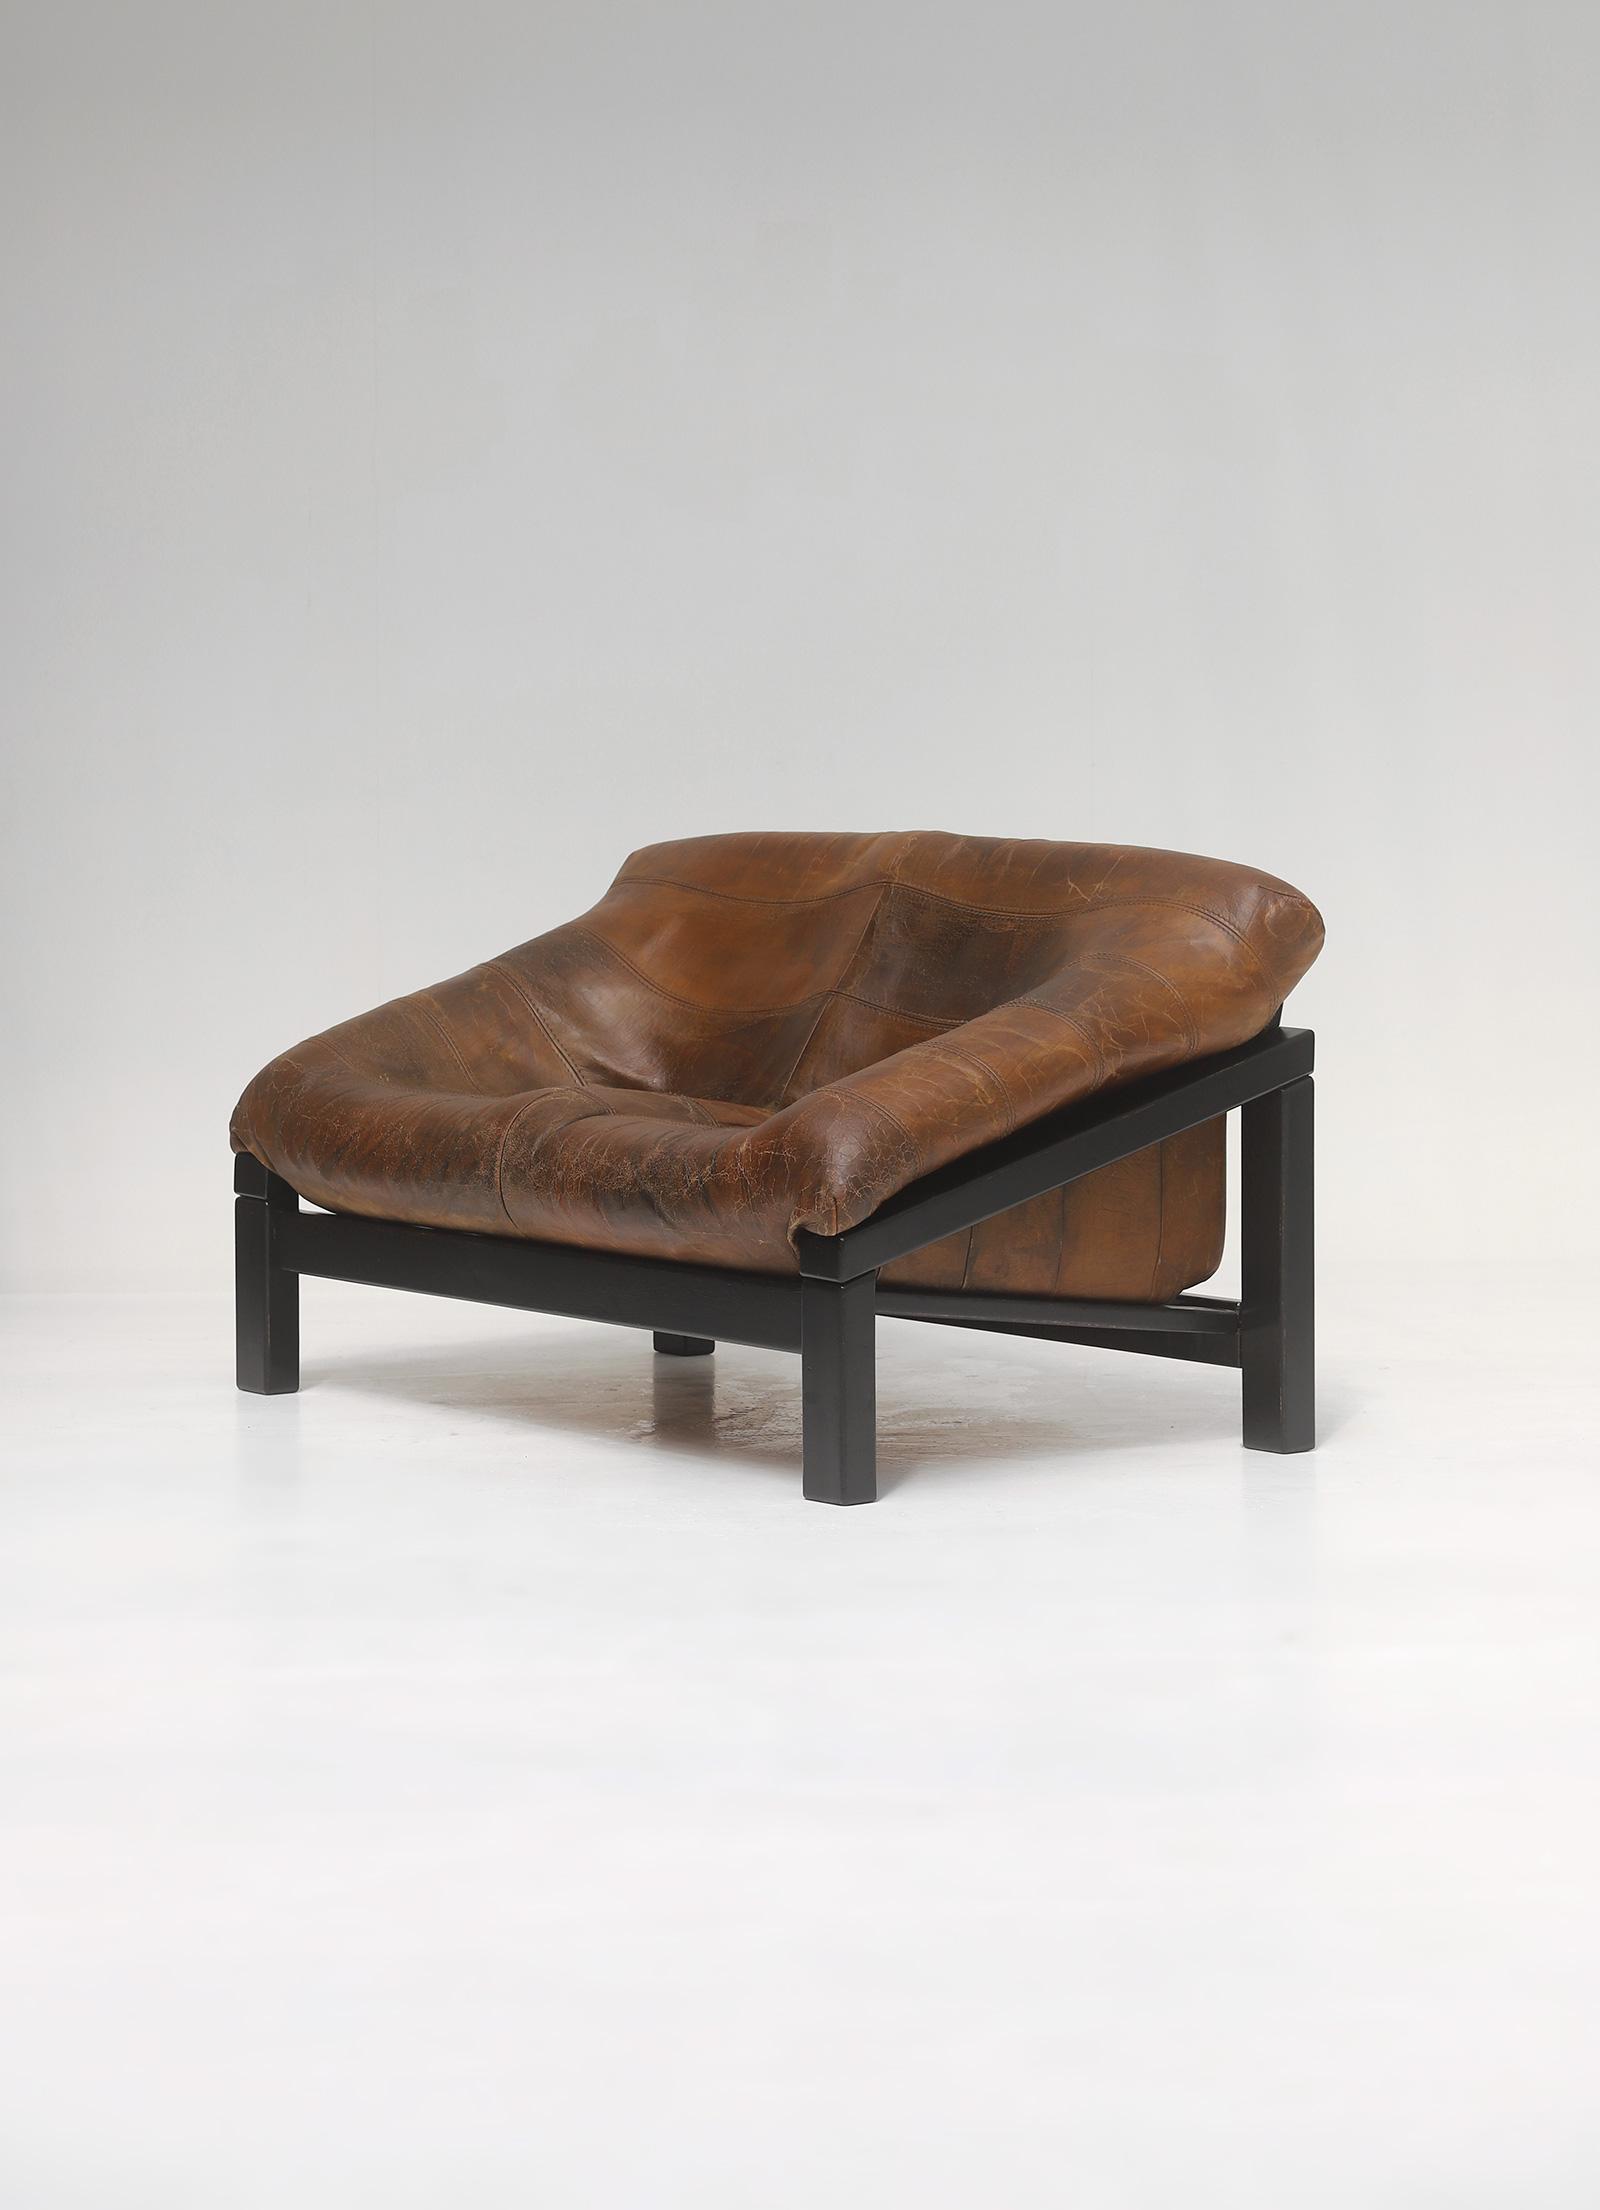 Decorative 2 seat leather Sofaimage 3